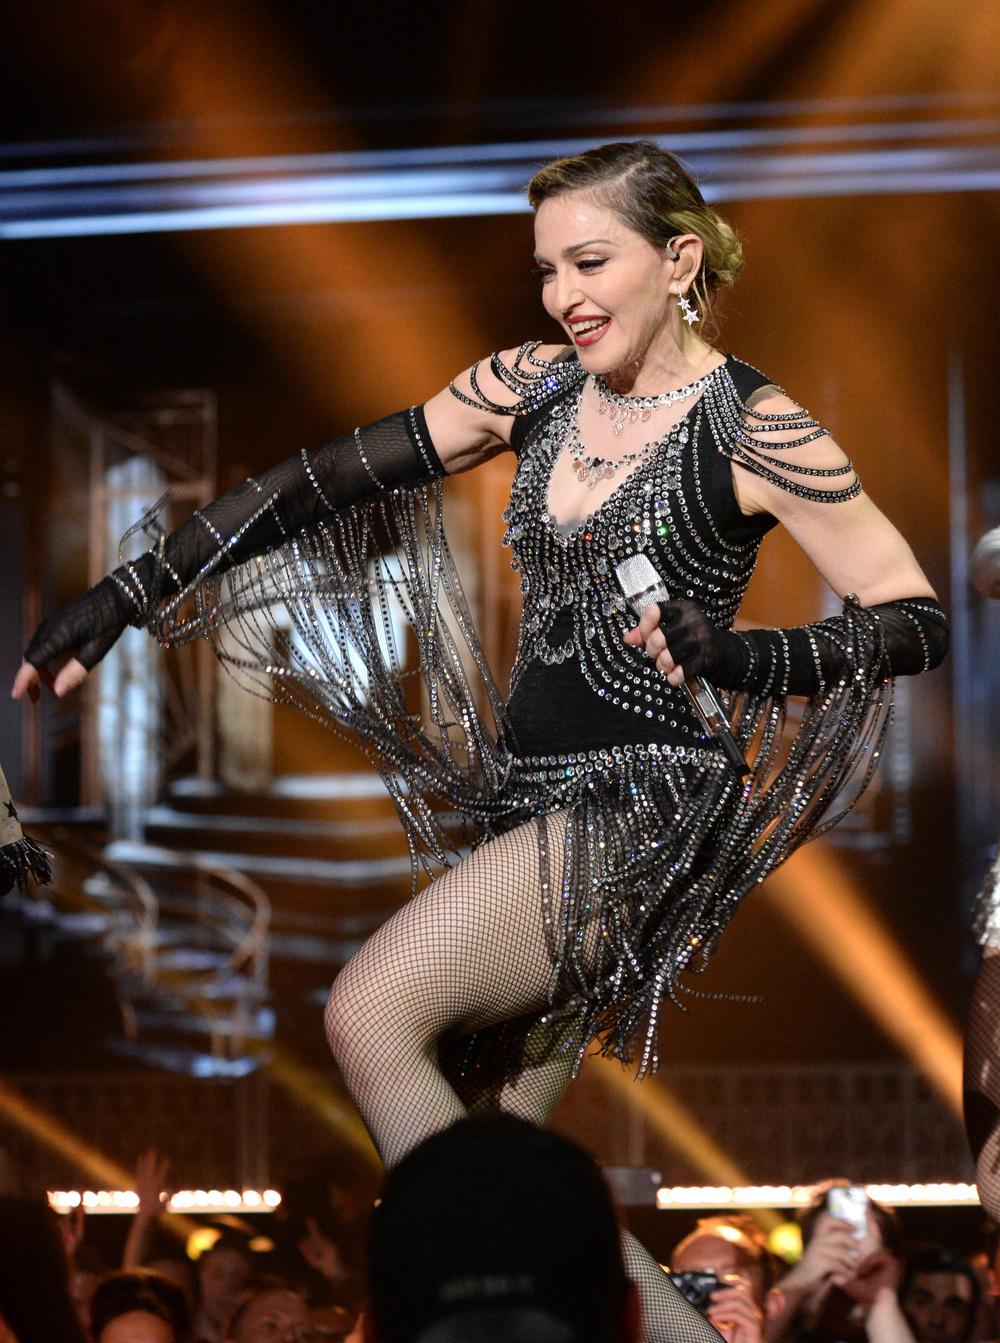 576711507LL074_Madonna_Rebe.JPG